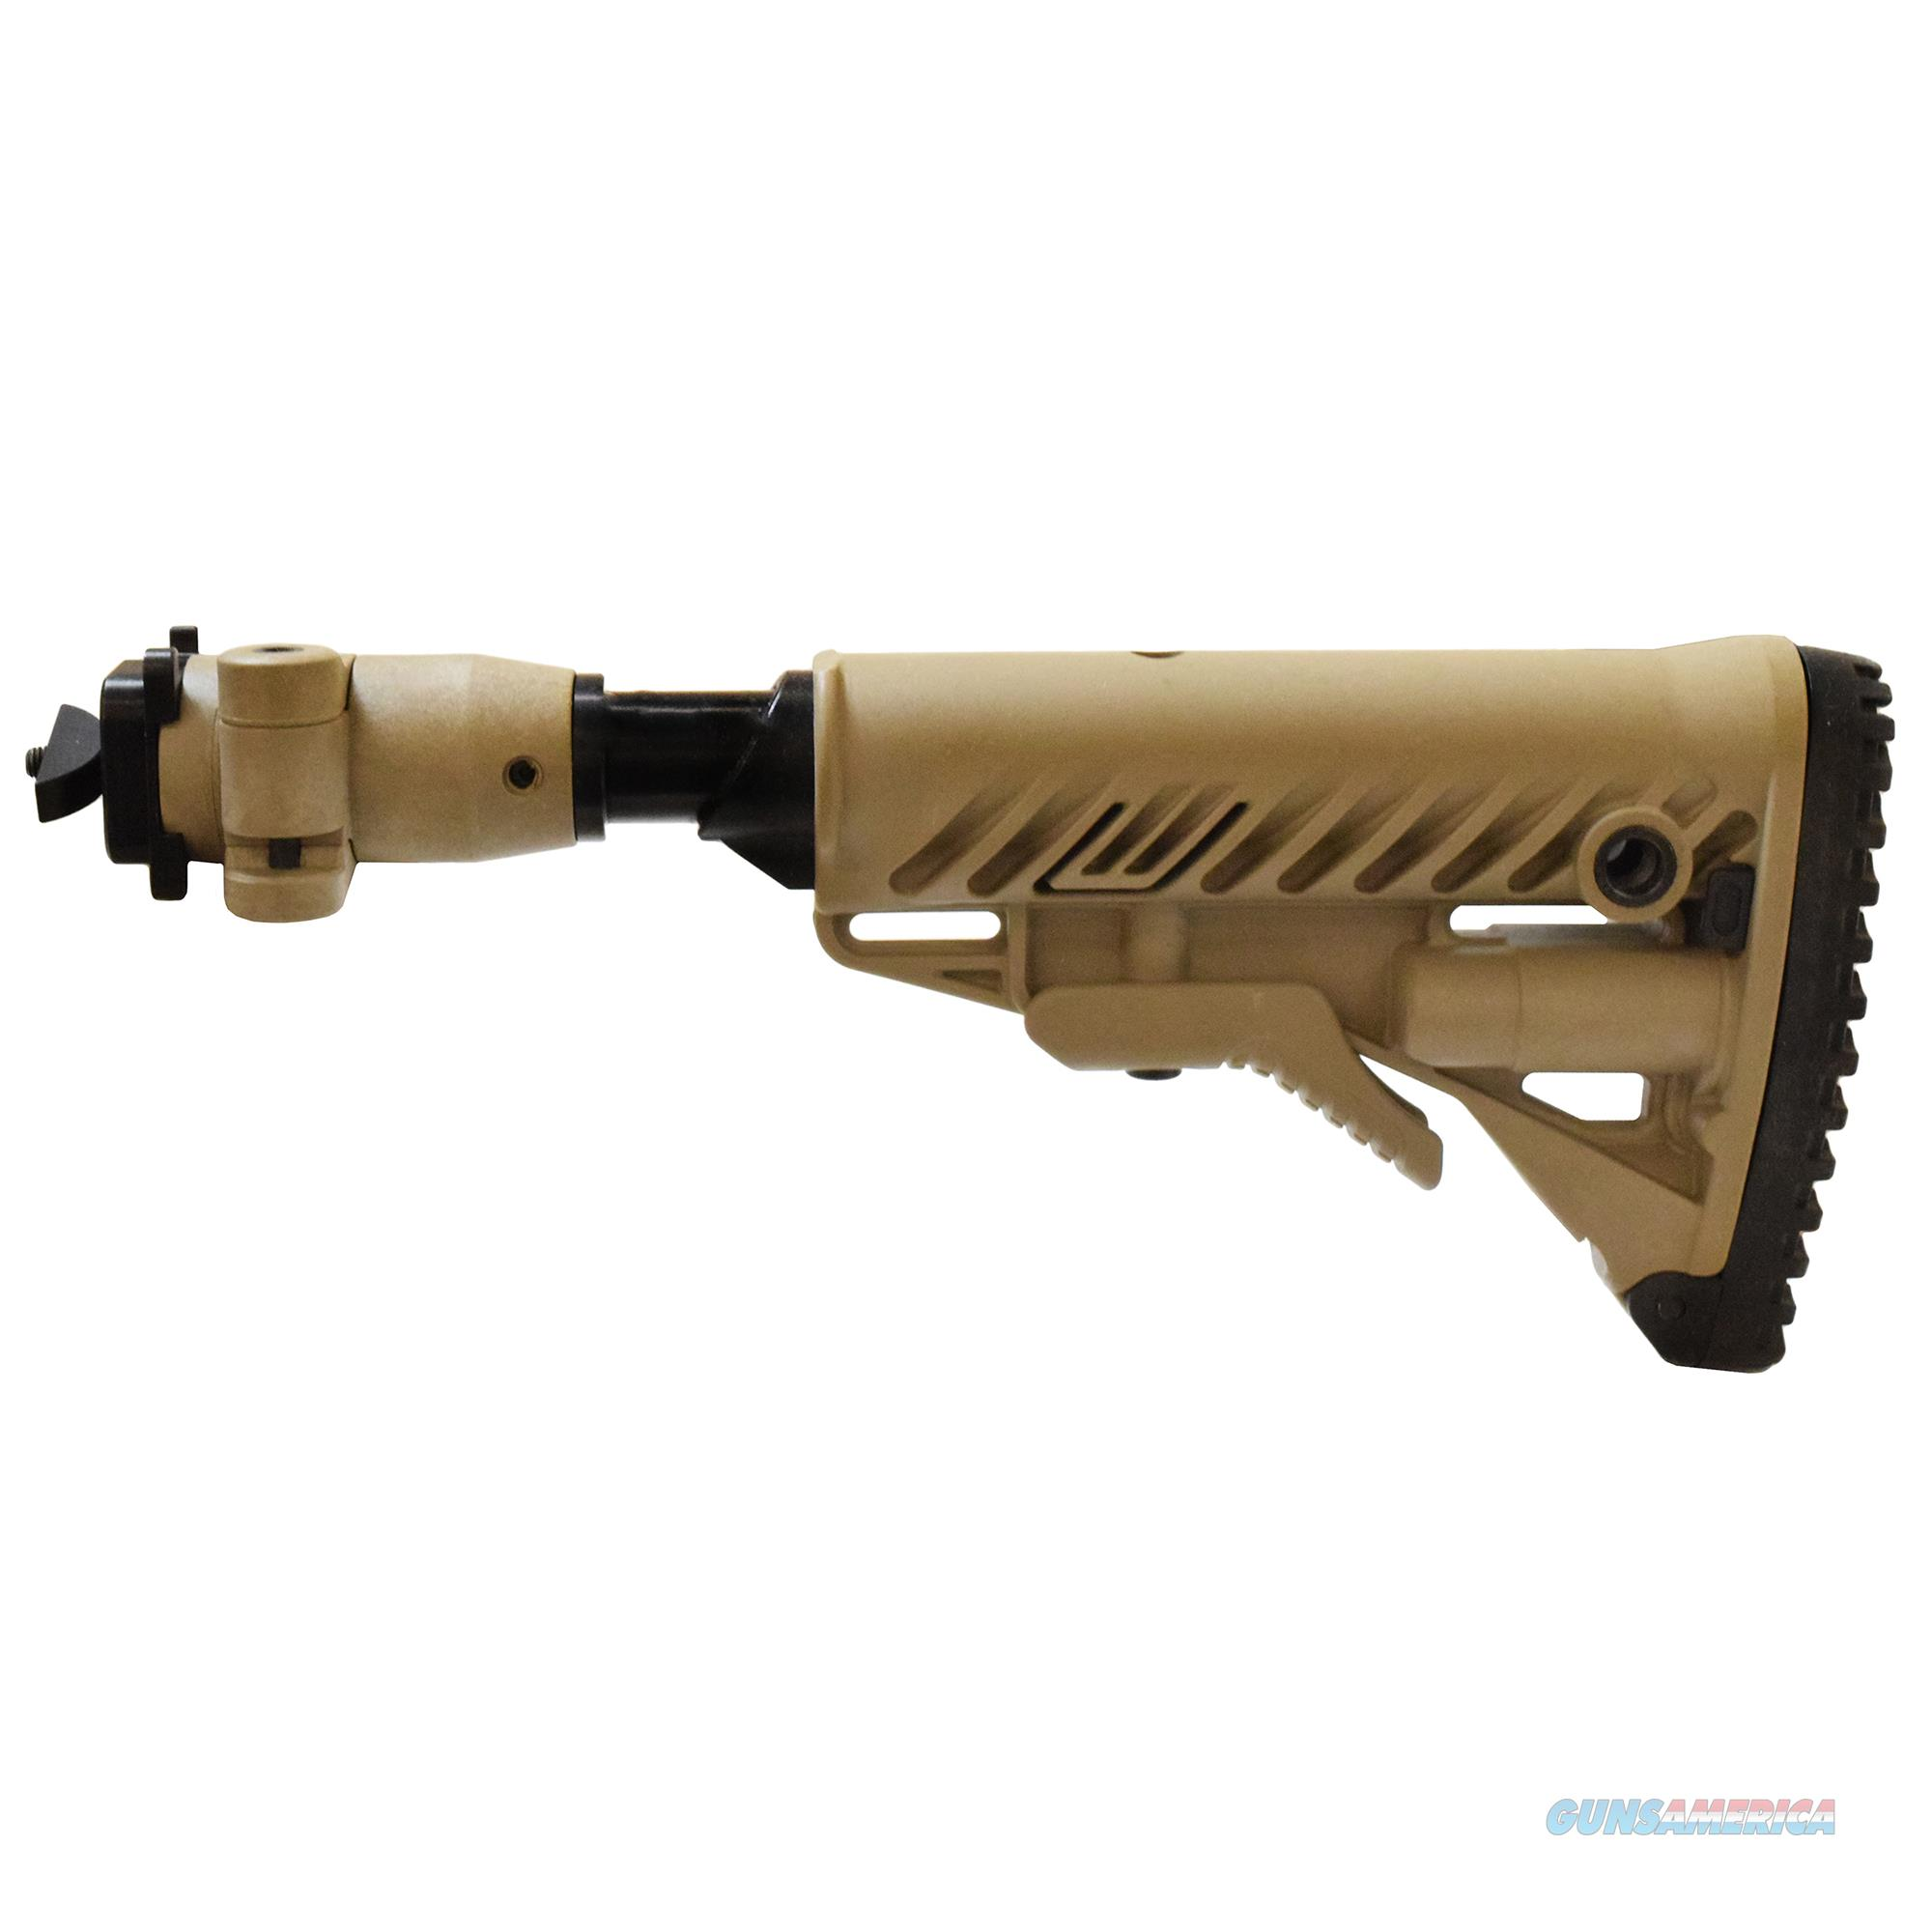 Mako Group Folding Collapsible Stock, Milled Ak Rifles, Flat Dark Earth M4-AKMILP-FDE  Non-Guns > Gunstocks, Grips & Wood